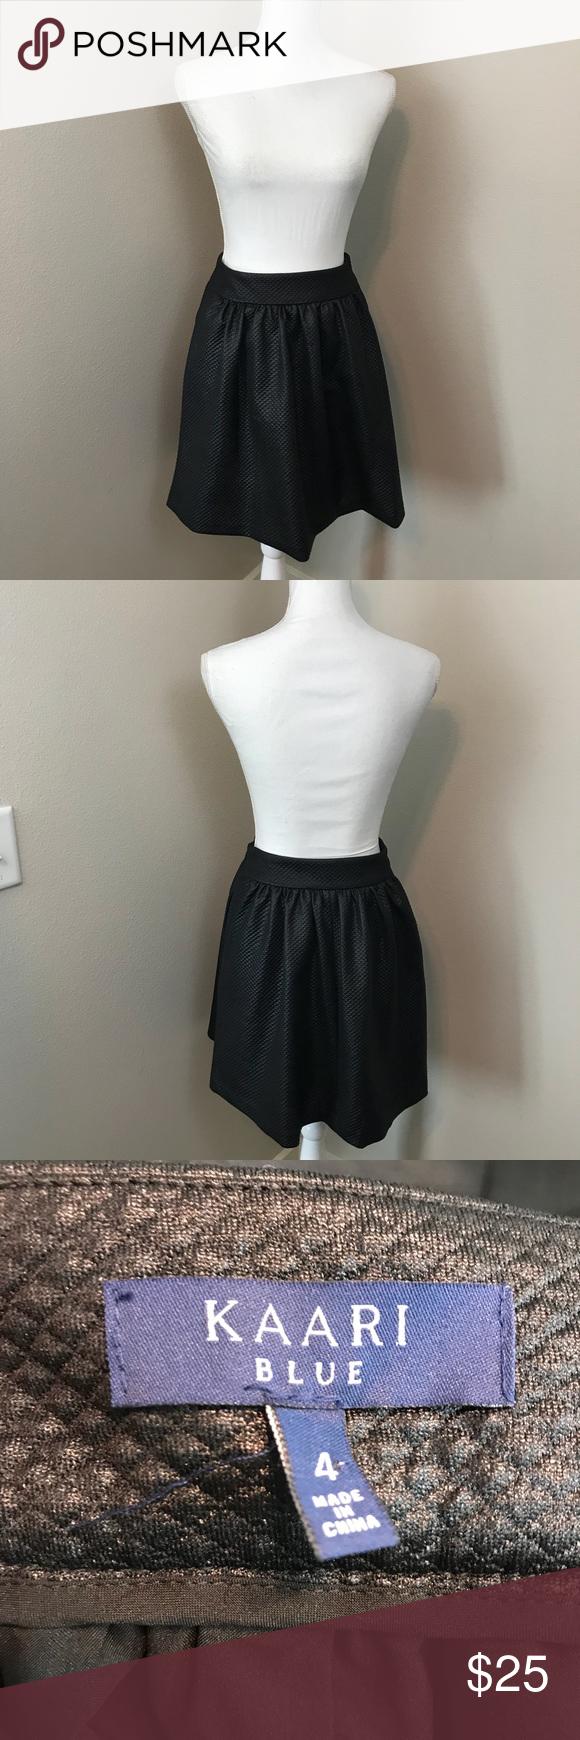 Kaari Blue Textured Skirt   Textured skirt, Fashion, Skirts